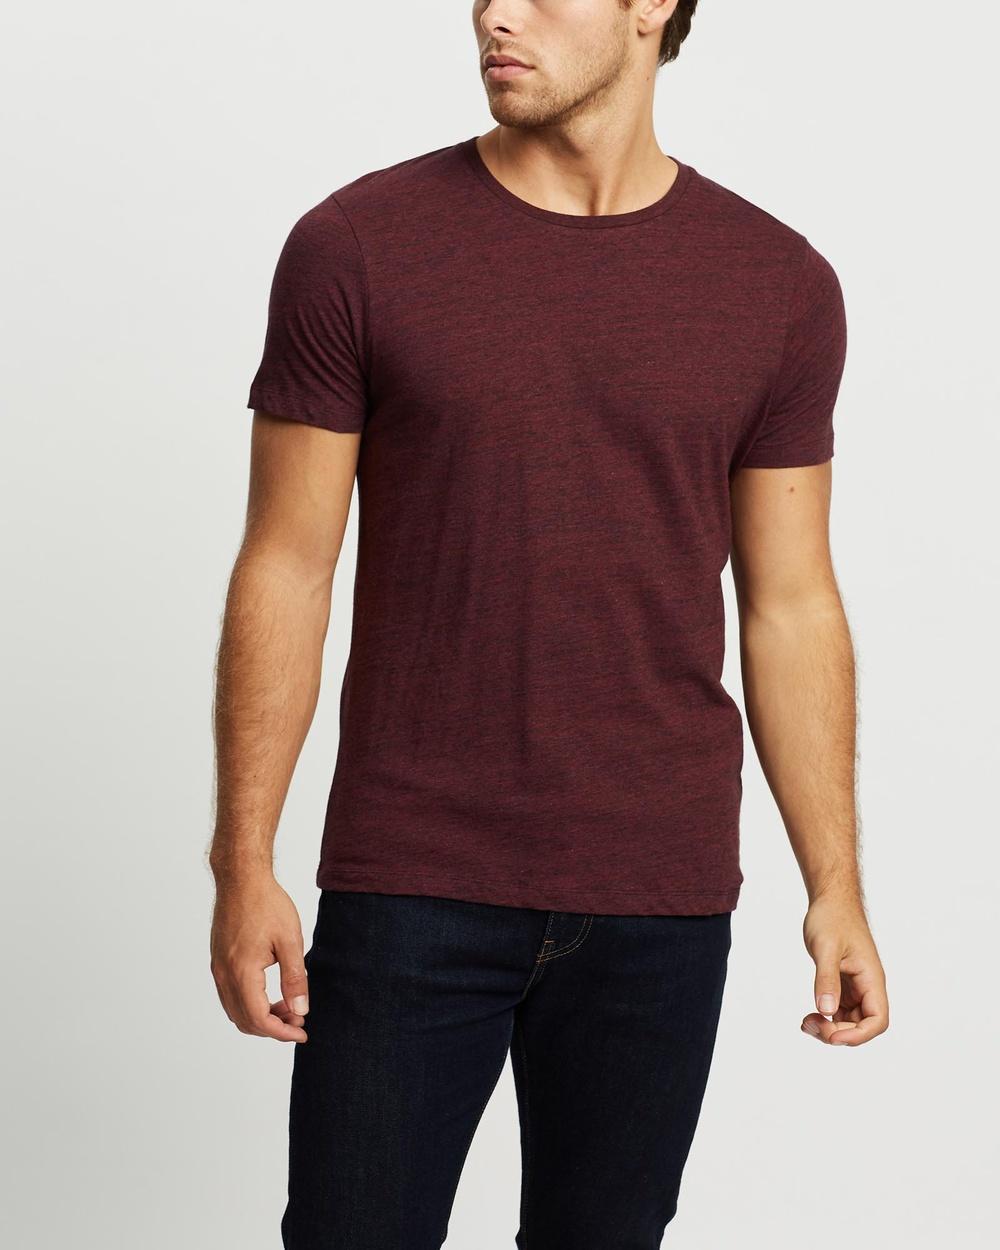 Marcs - Marle Brando Crew T Shirt - T-Shirts & Singlets (Berry Marle) Marle Brando Crew T-Shirt